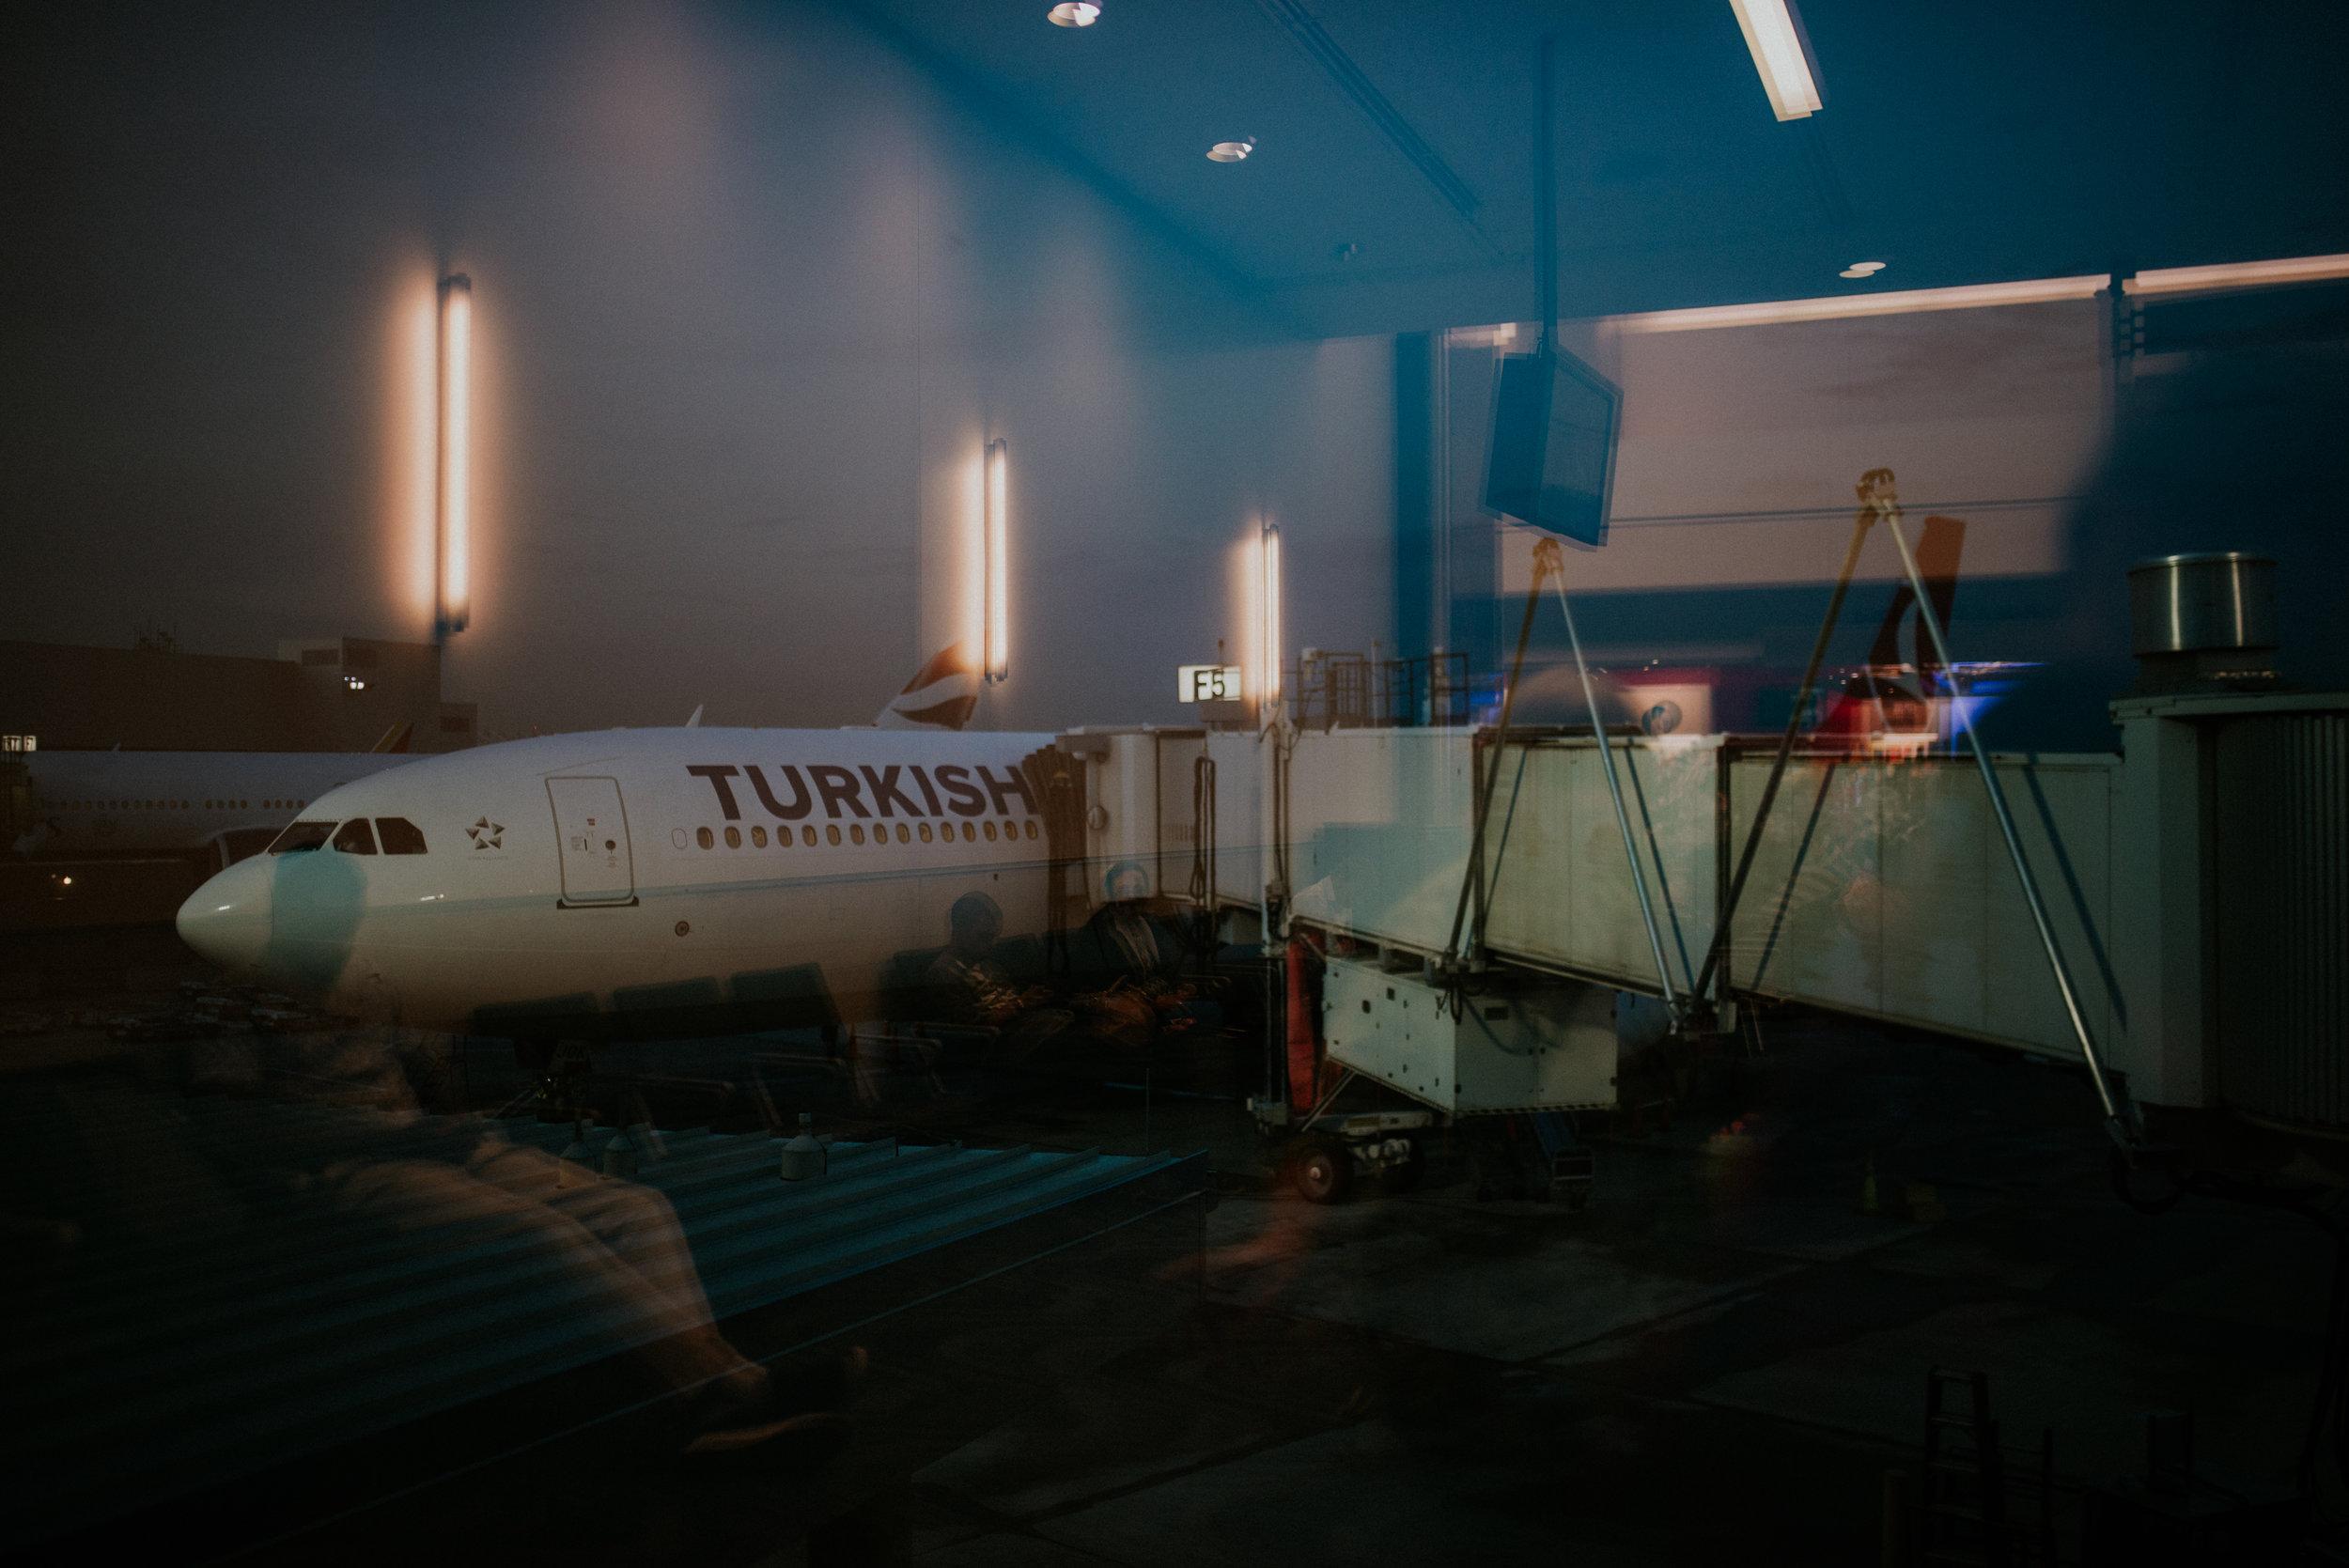 istanbul-turkey-trip-6.jpg